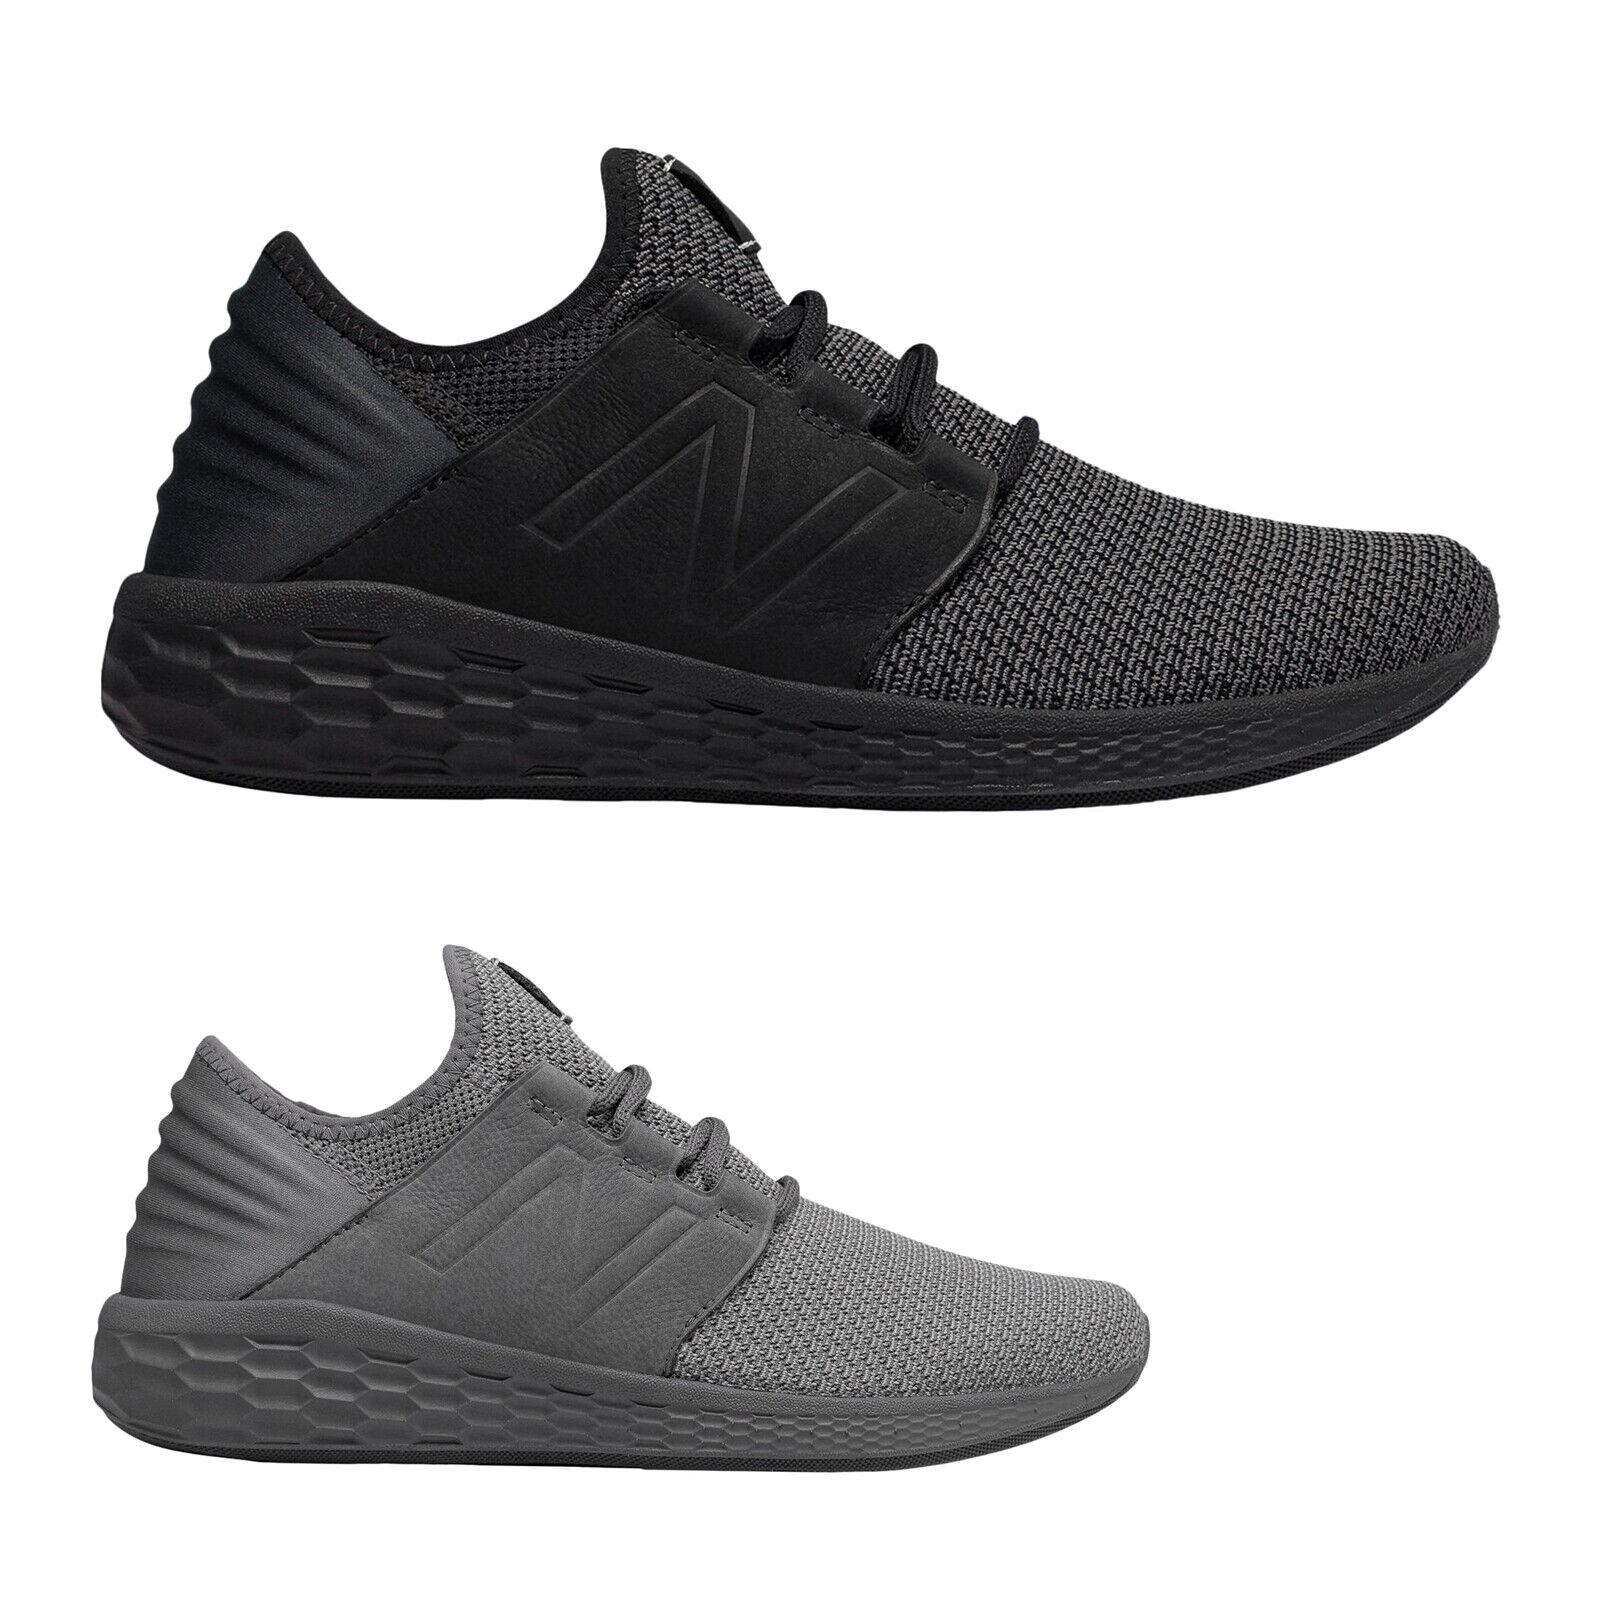 New Balance MCRUZ Textile Low-Top Slip-On Running Mens Trainers